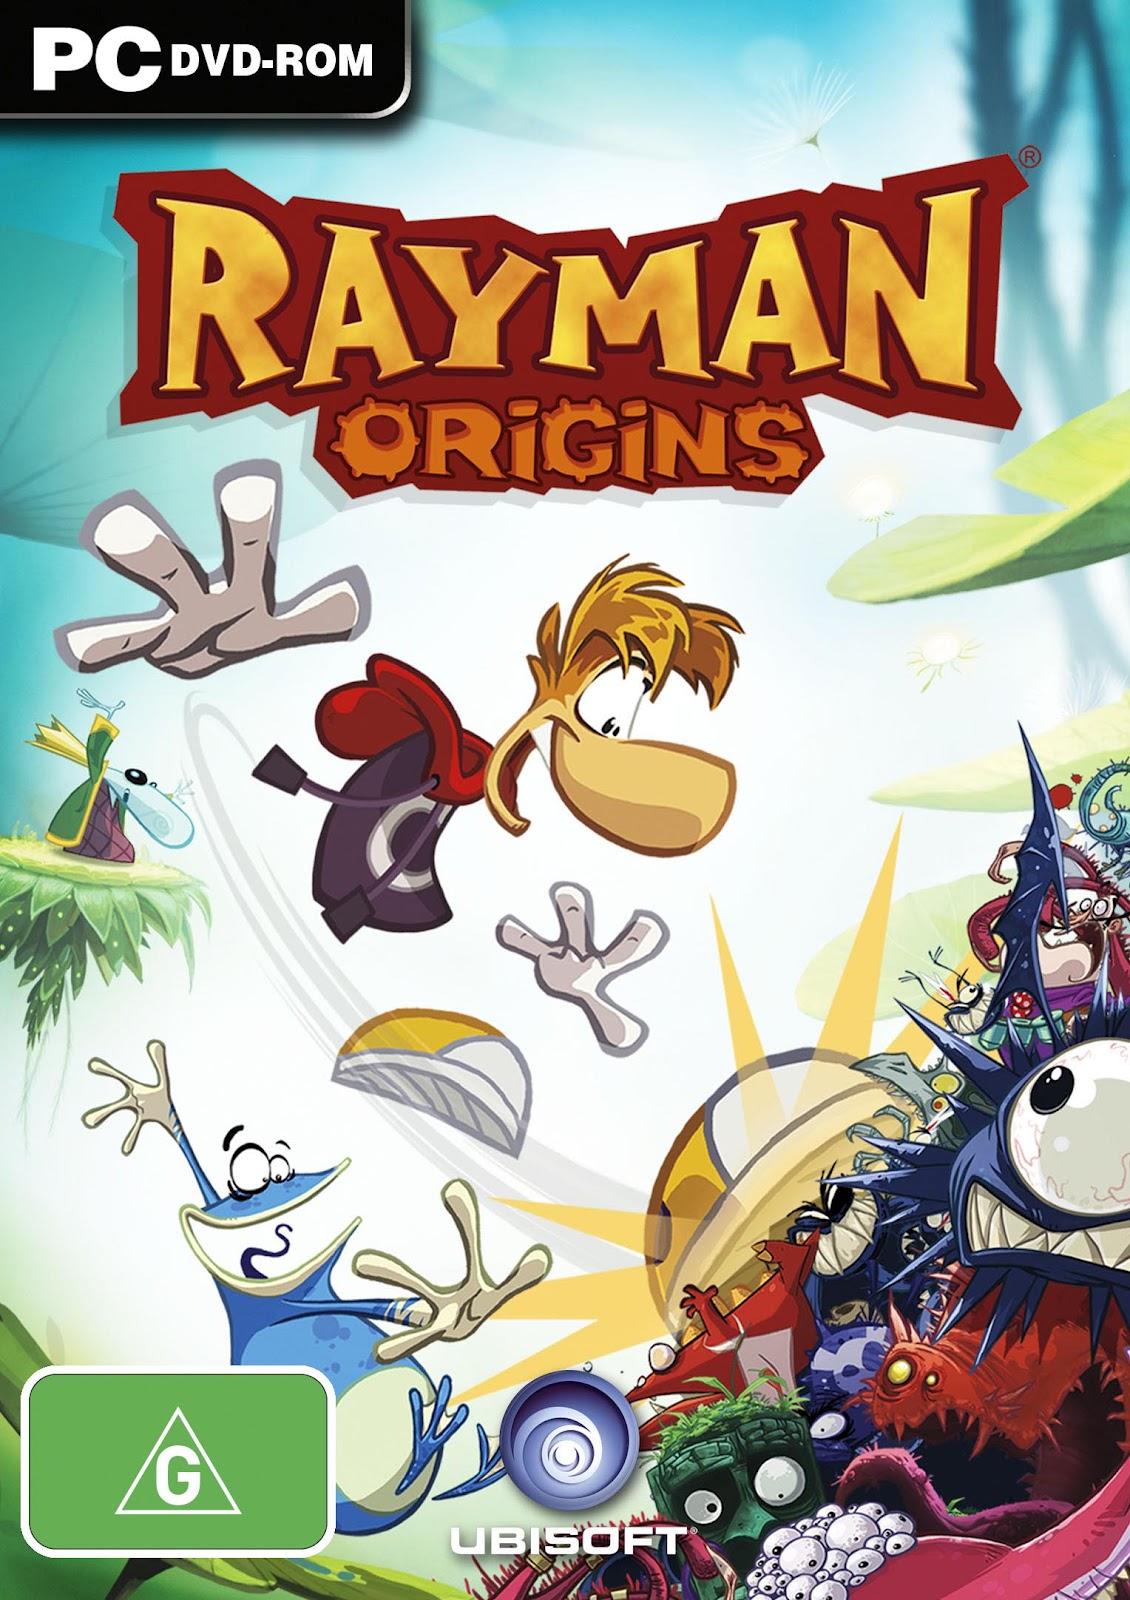 Free Rayman Games